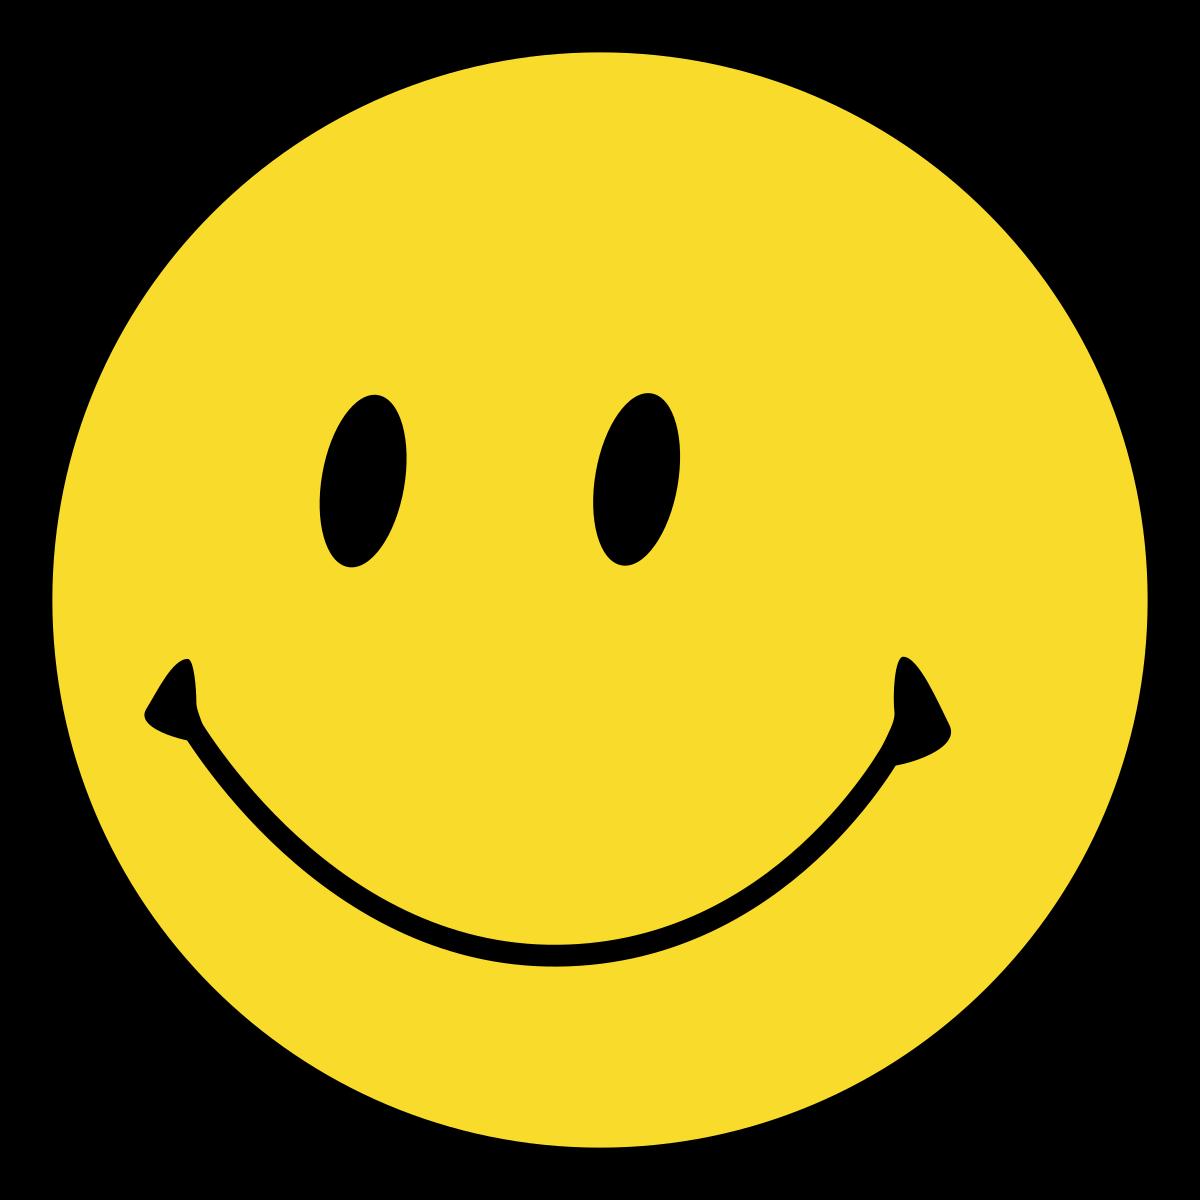 Smiley.